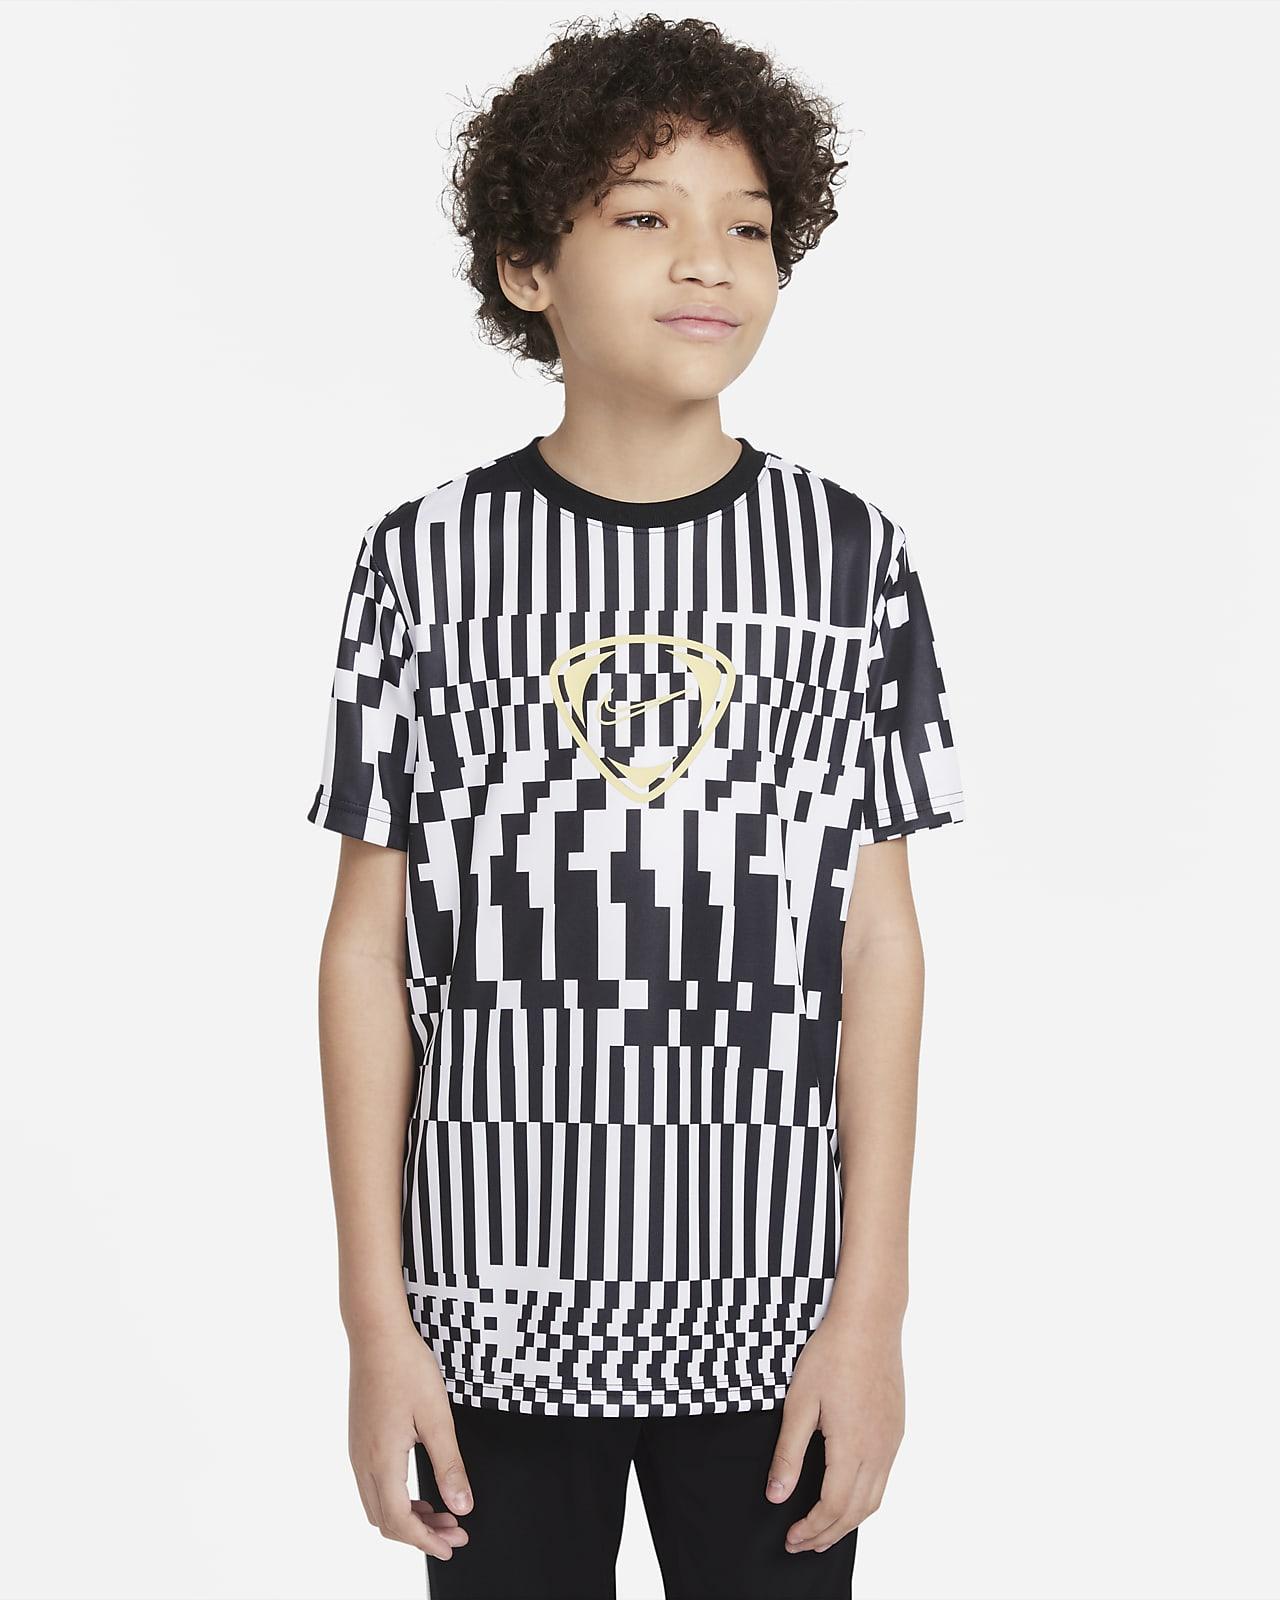 Nike Dri-FIT Academy Big Kids' Soccer T-Shirt